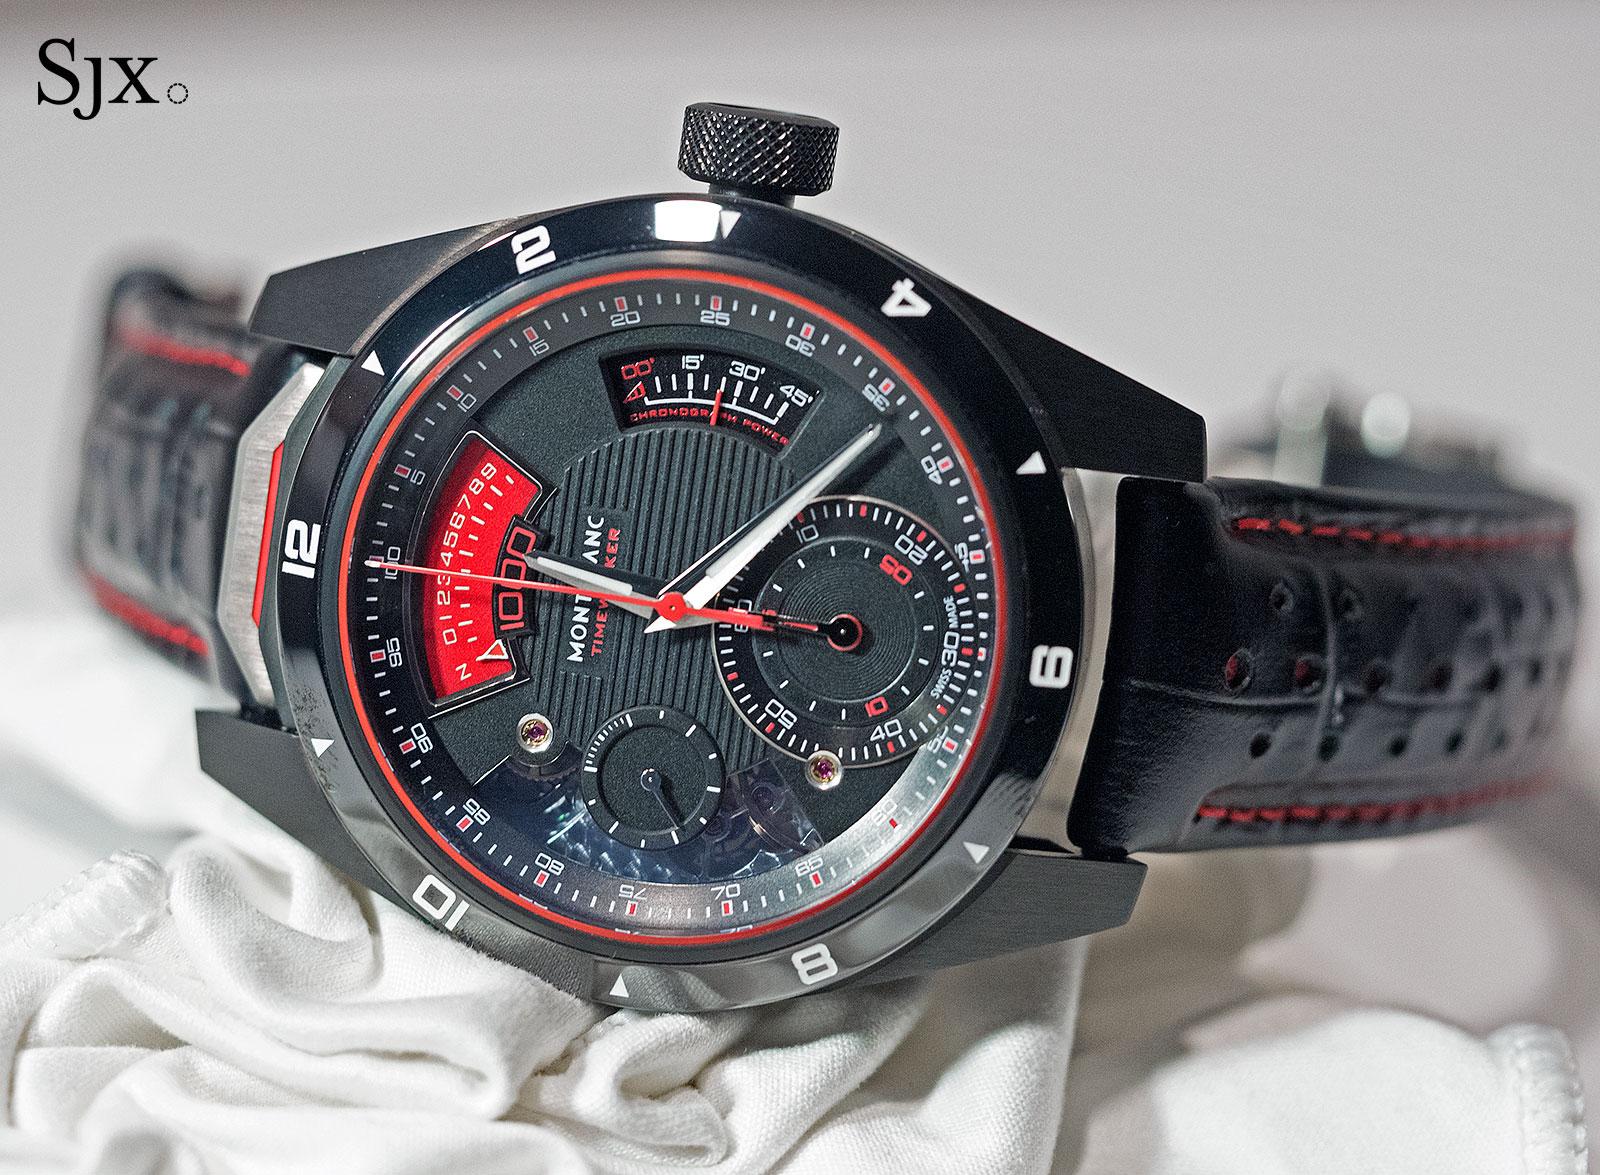 Montblanc TimeWalker Chronograph 1000 Limited Edition 18-1